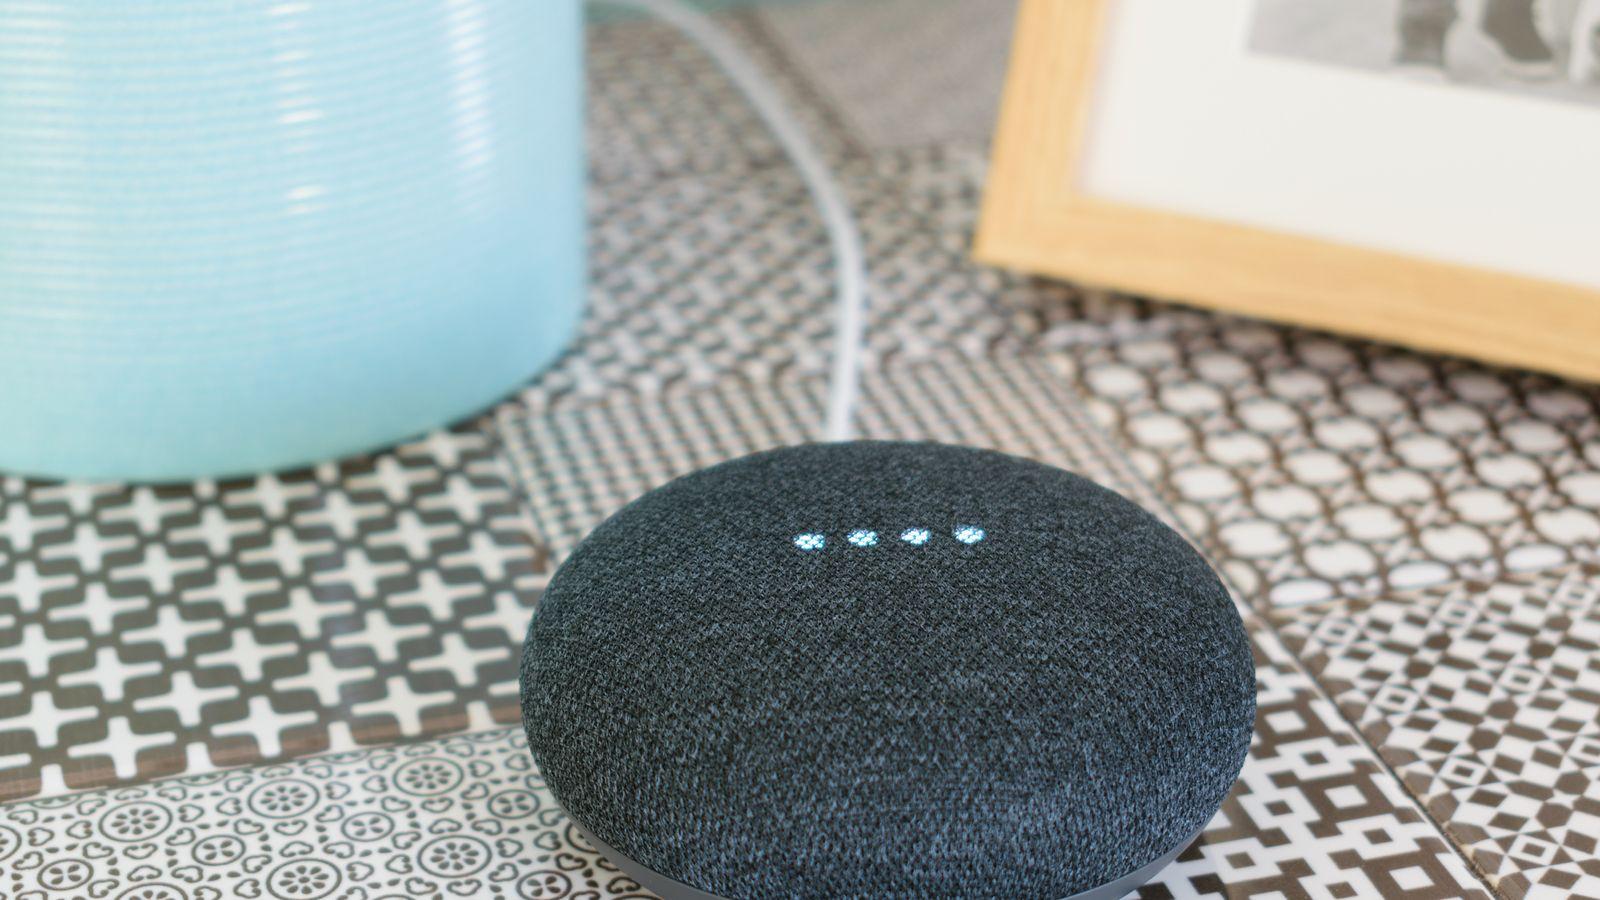 Hey Google, am I skint?: NatWest to offer smart speaker banking